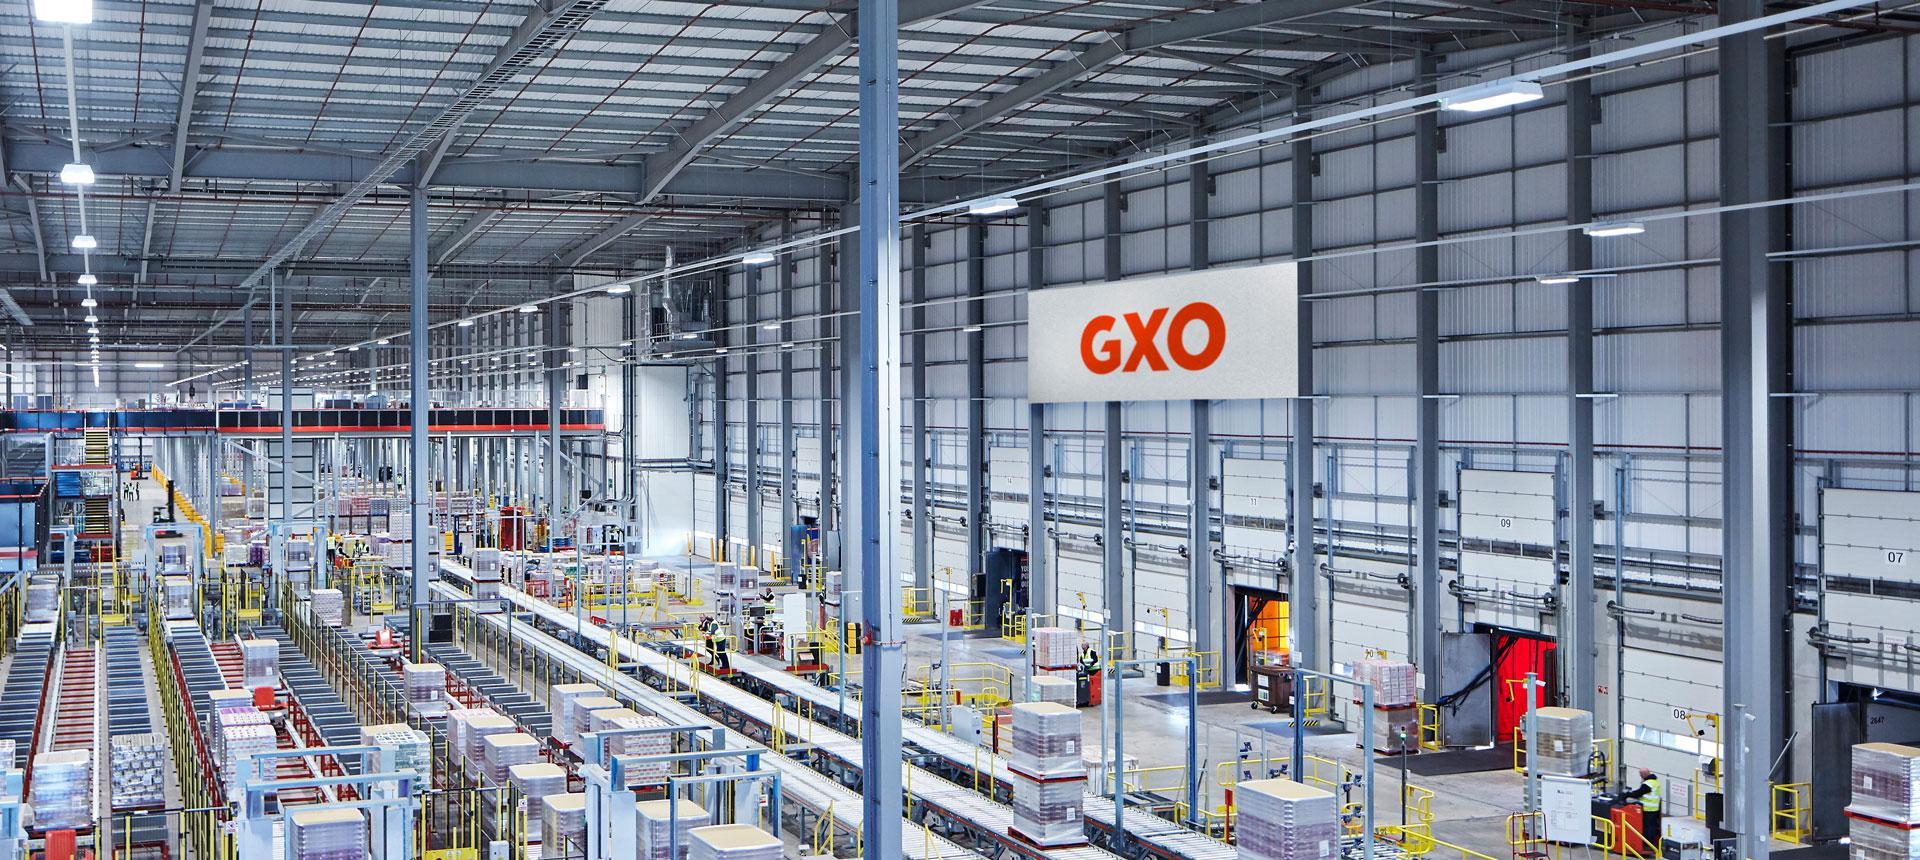 GXO distribution center